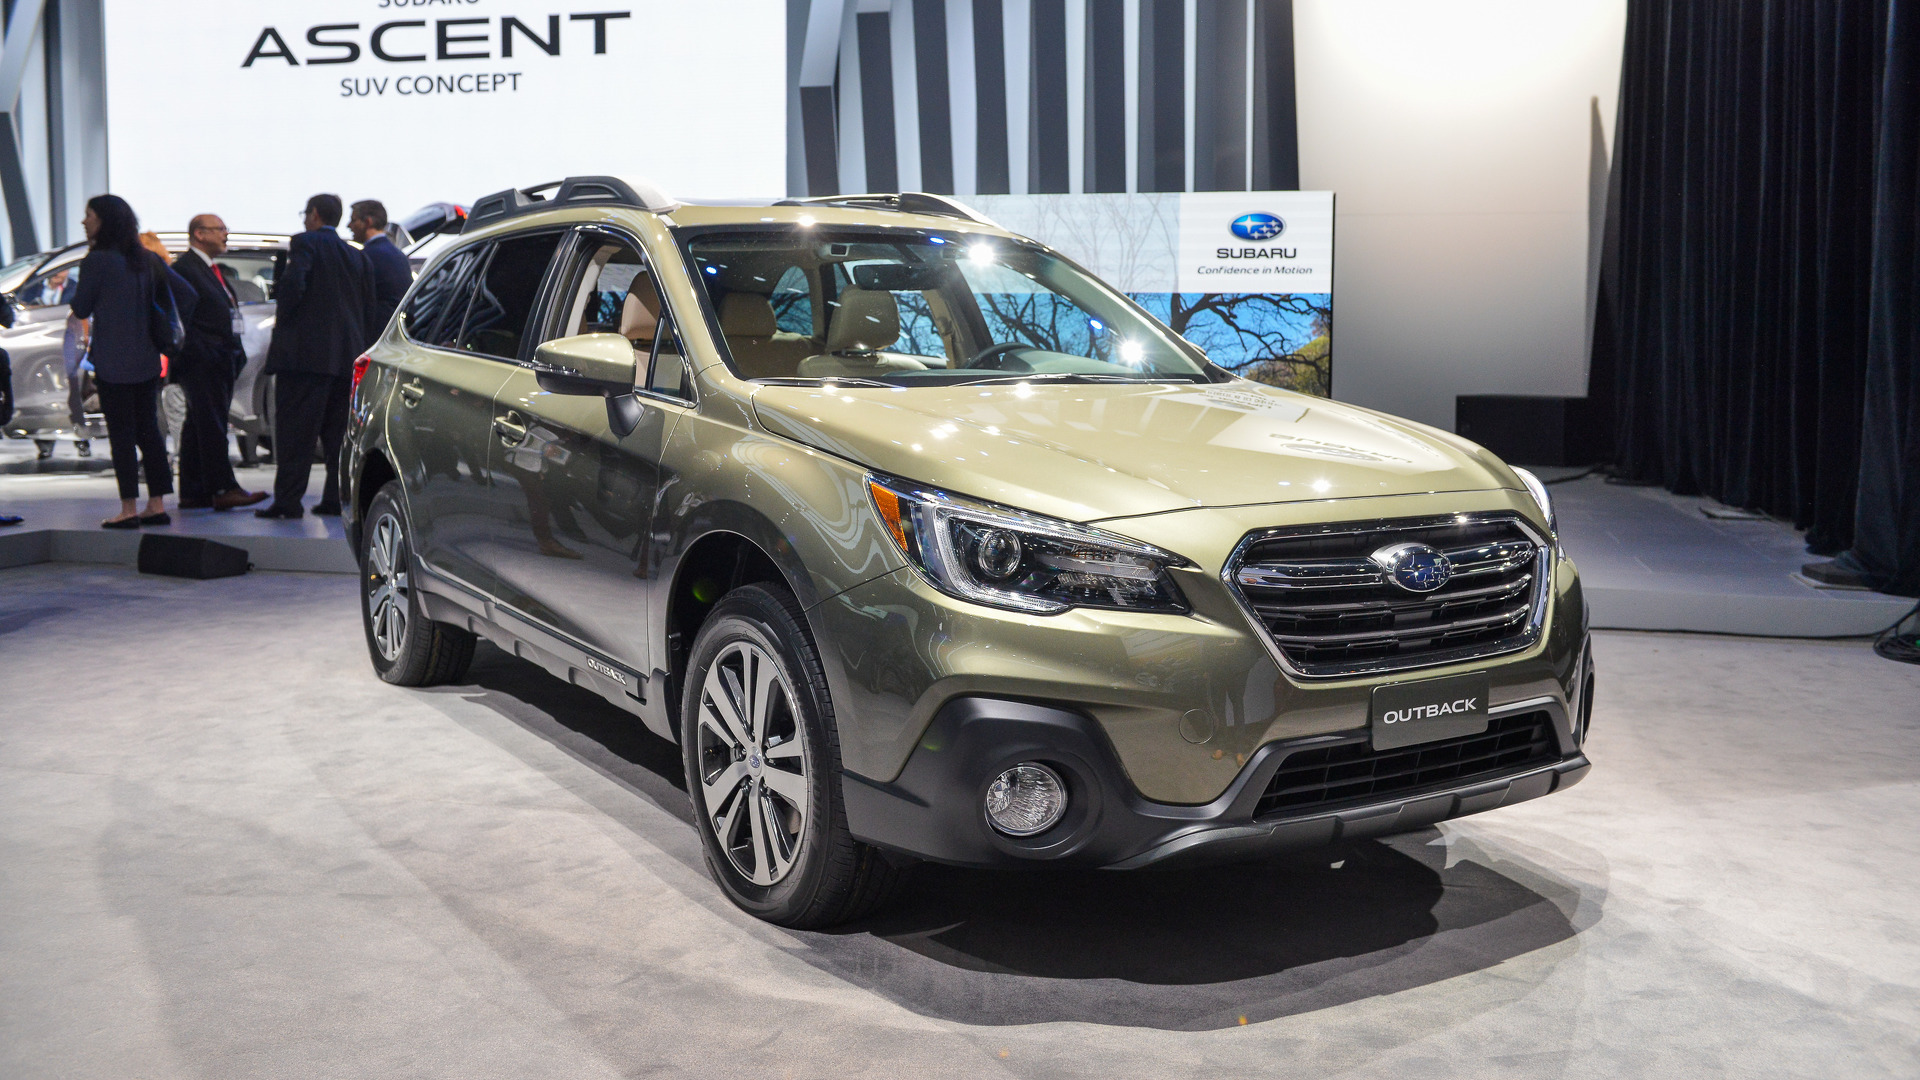 2018 Subaru Outback Motor1 Photos